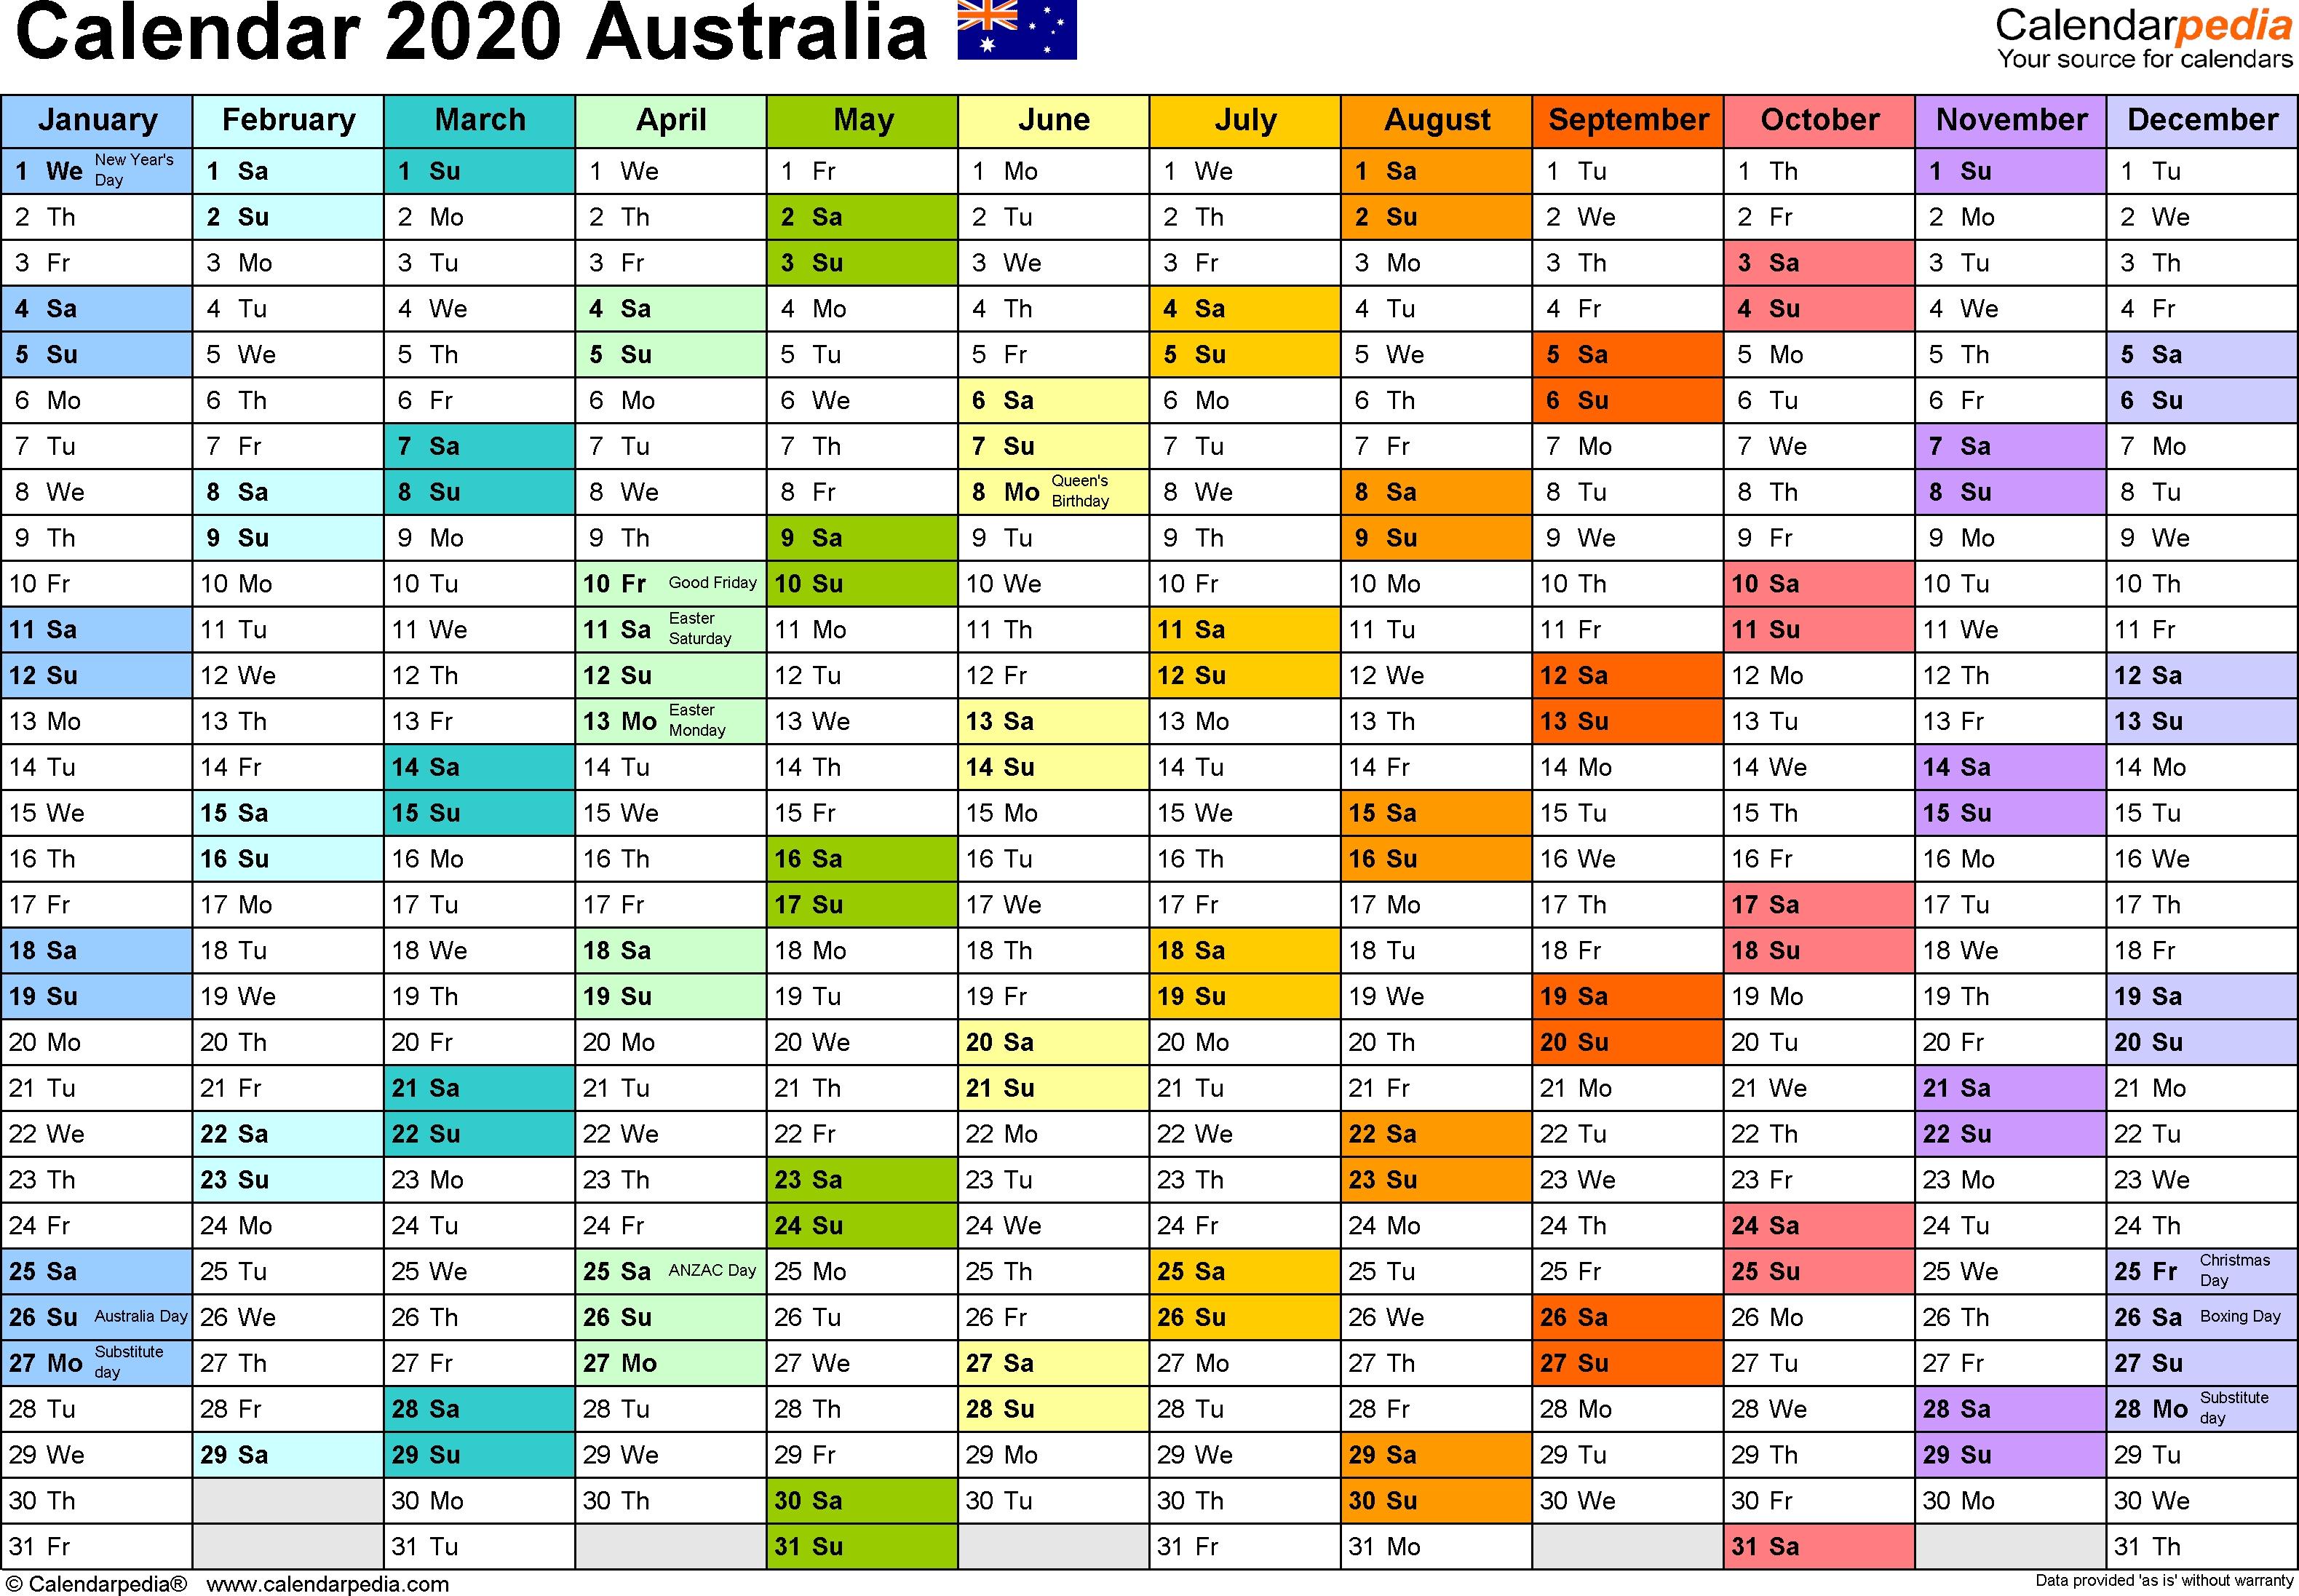 Australia Calendar 2020 - Free Printable Pdf Templates-January 2020 Calendar Qld